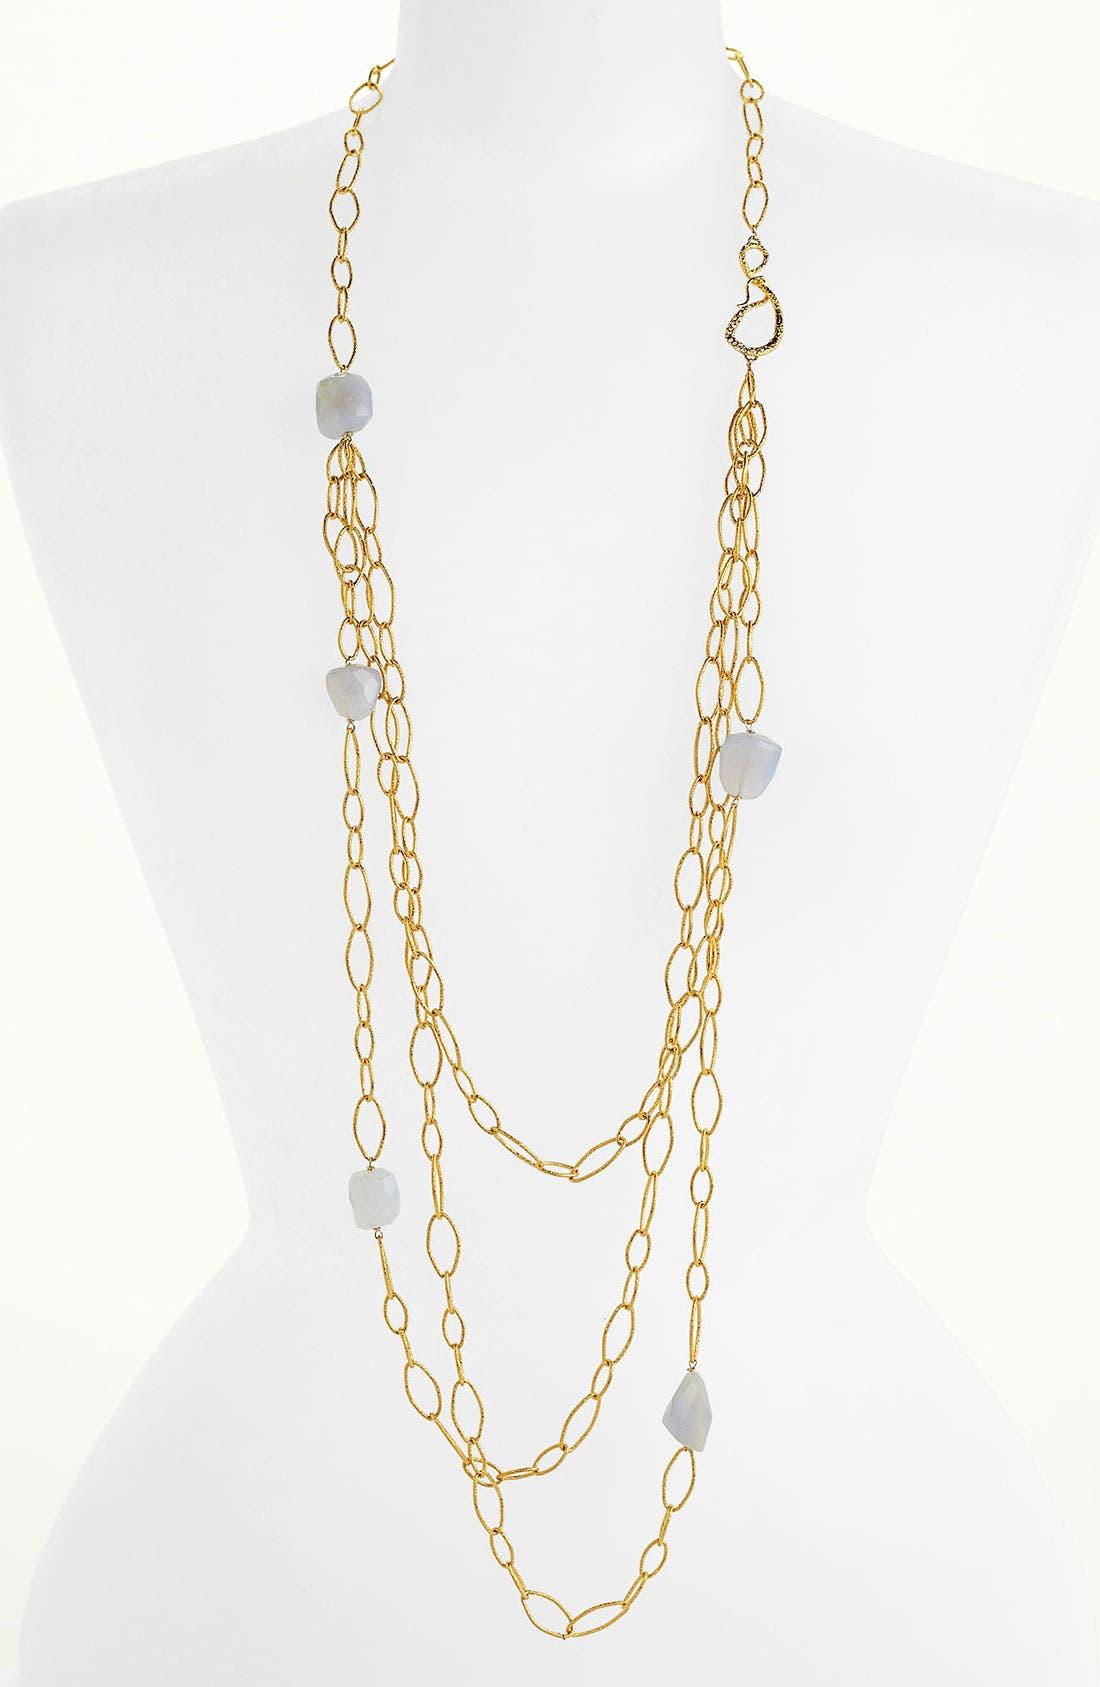 Main Image - Alexis Bittar 'Elements - Siyabona' Long Link Necklace